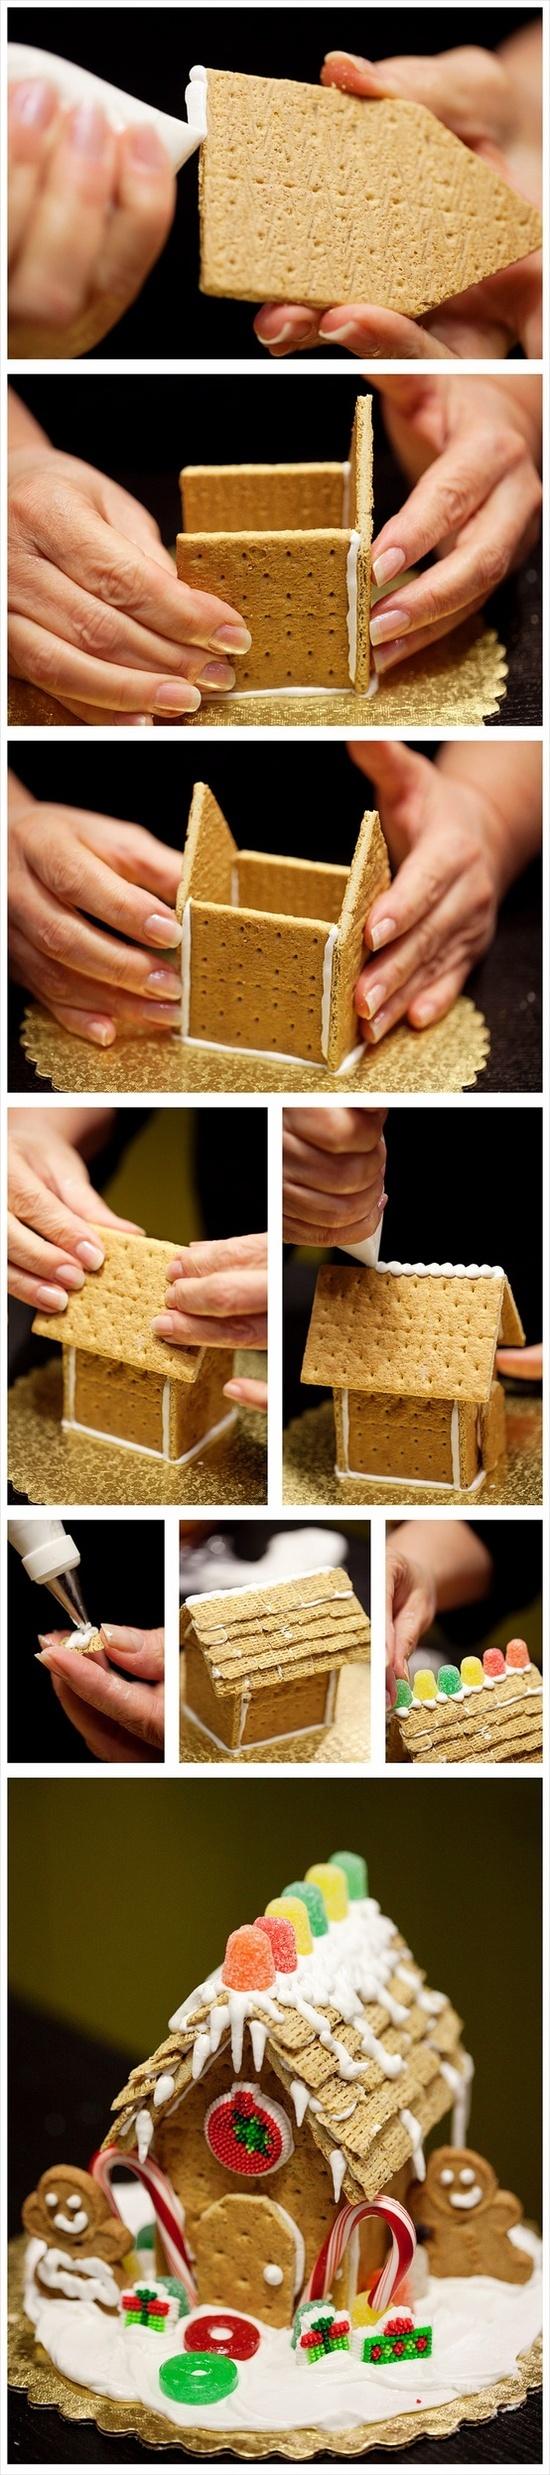 diy gingerbread house... / This is actually a cute idea :) Check more at http://hrenoten.com